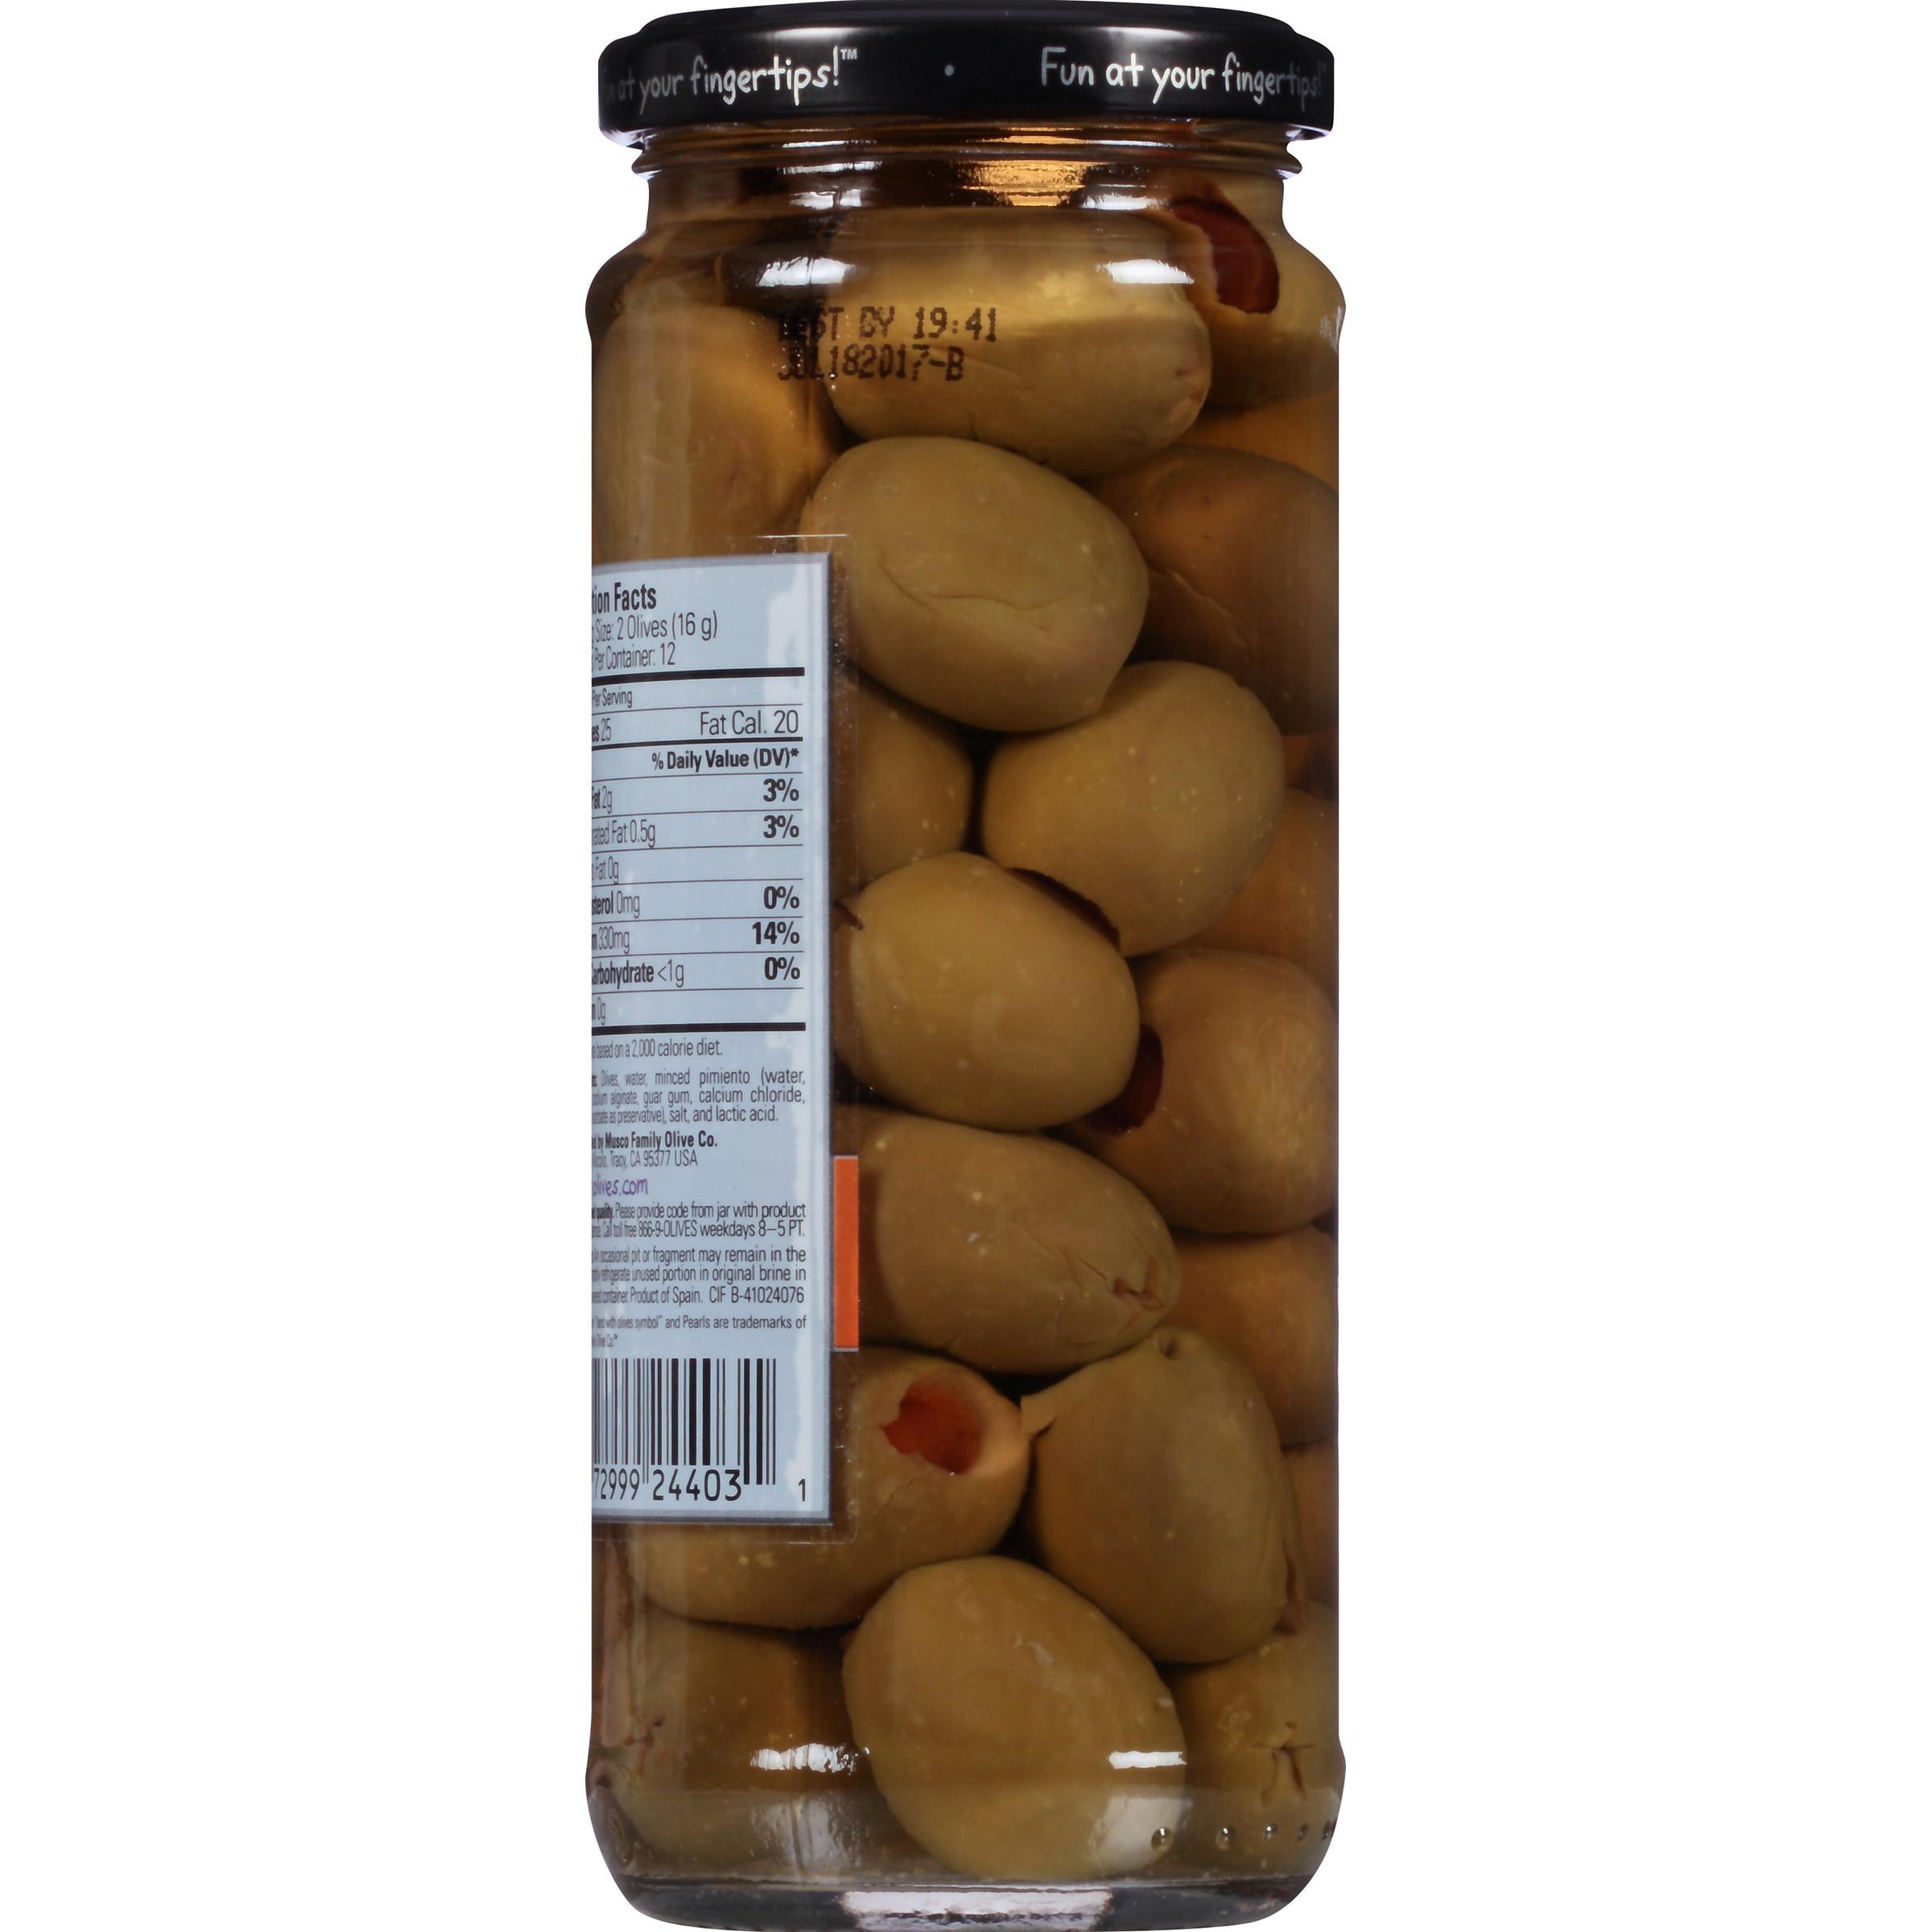 Pearls® Pimiento Stuffed Queen Olives, 7 oz. Jar - Walmart.com